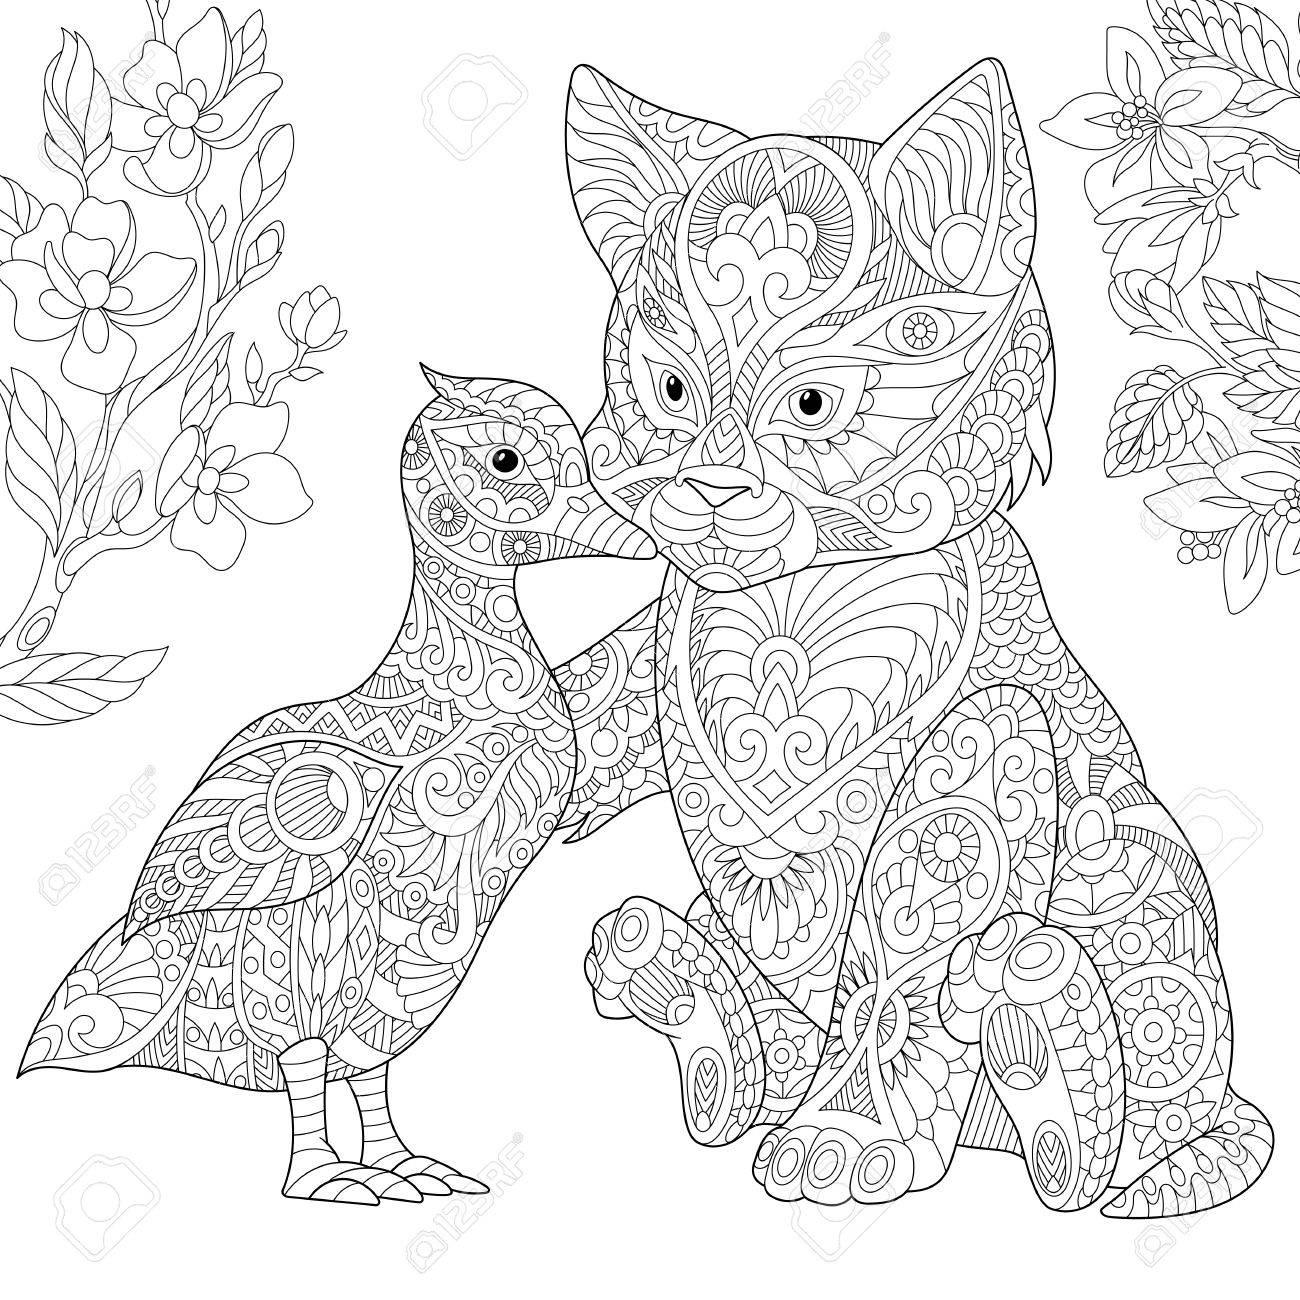 Dibujo Para Colorear. Gato Y Pato Abrazándose. Dibujo De Bosquejo A ...